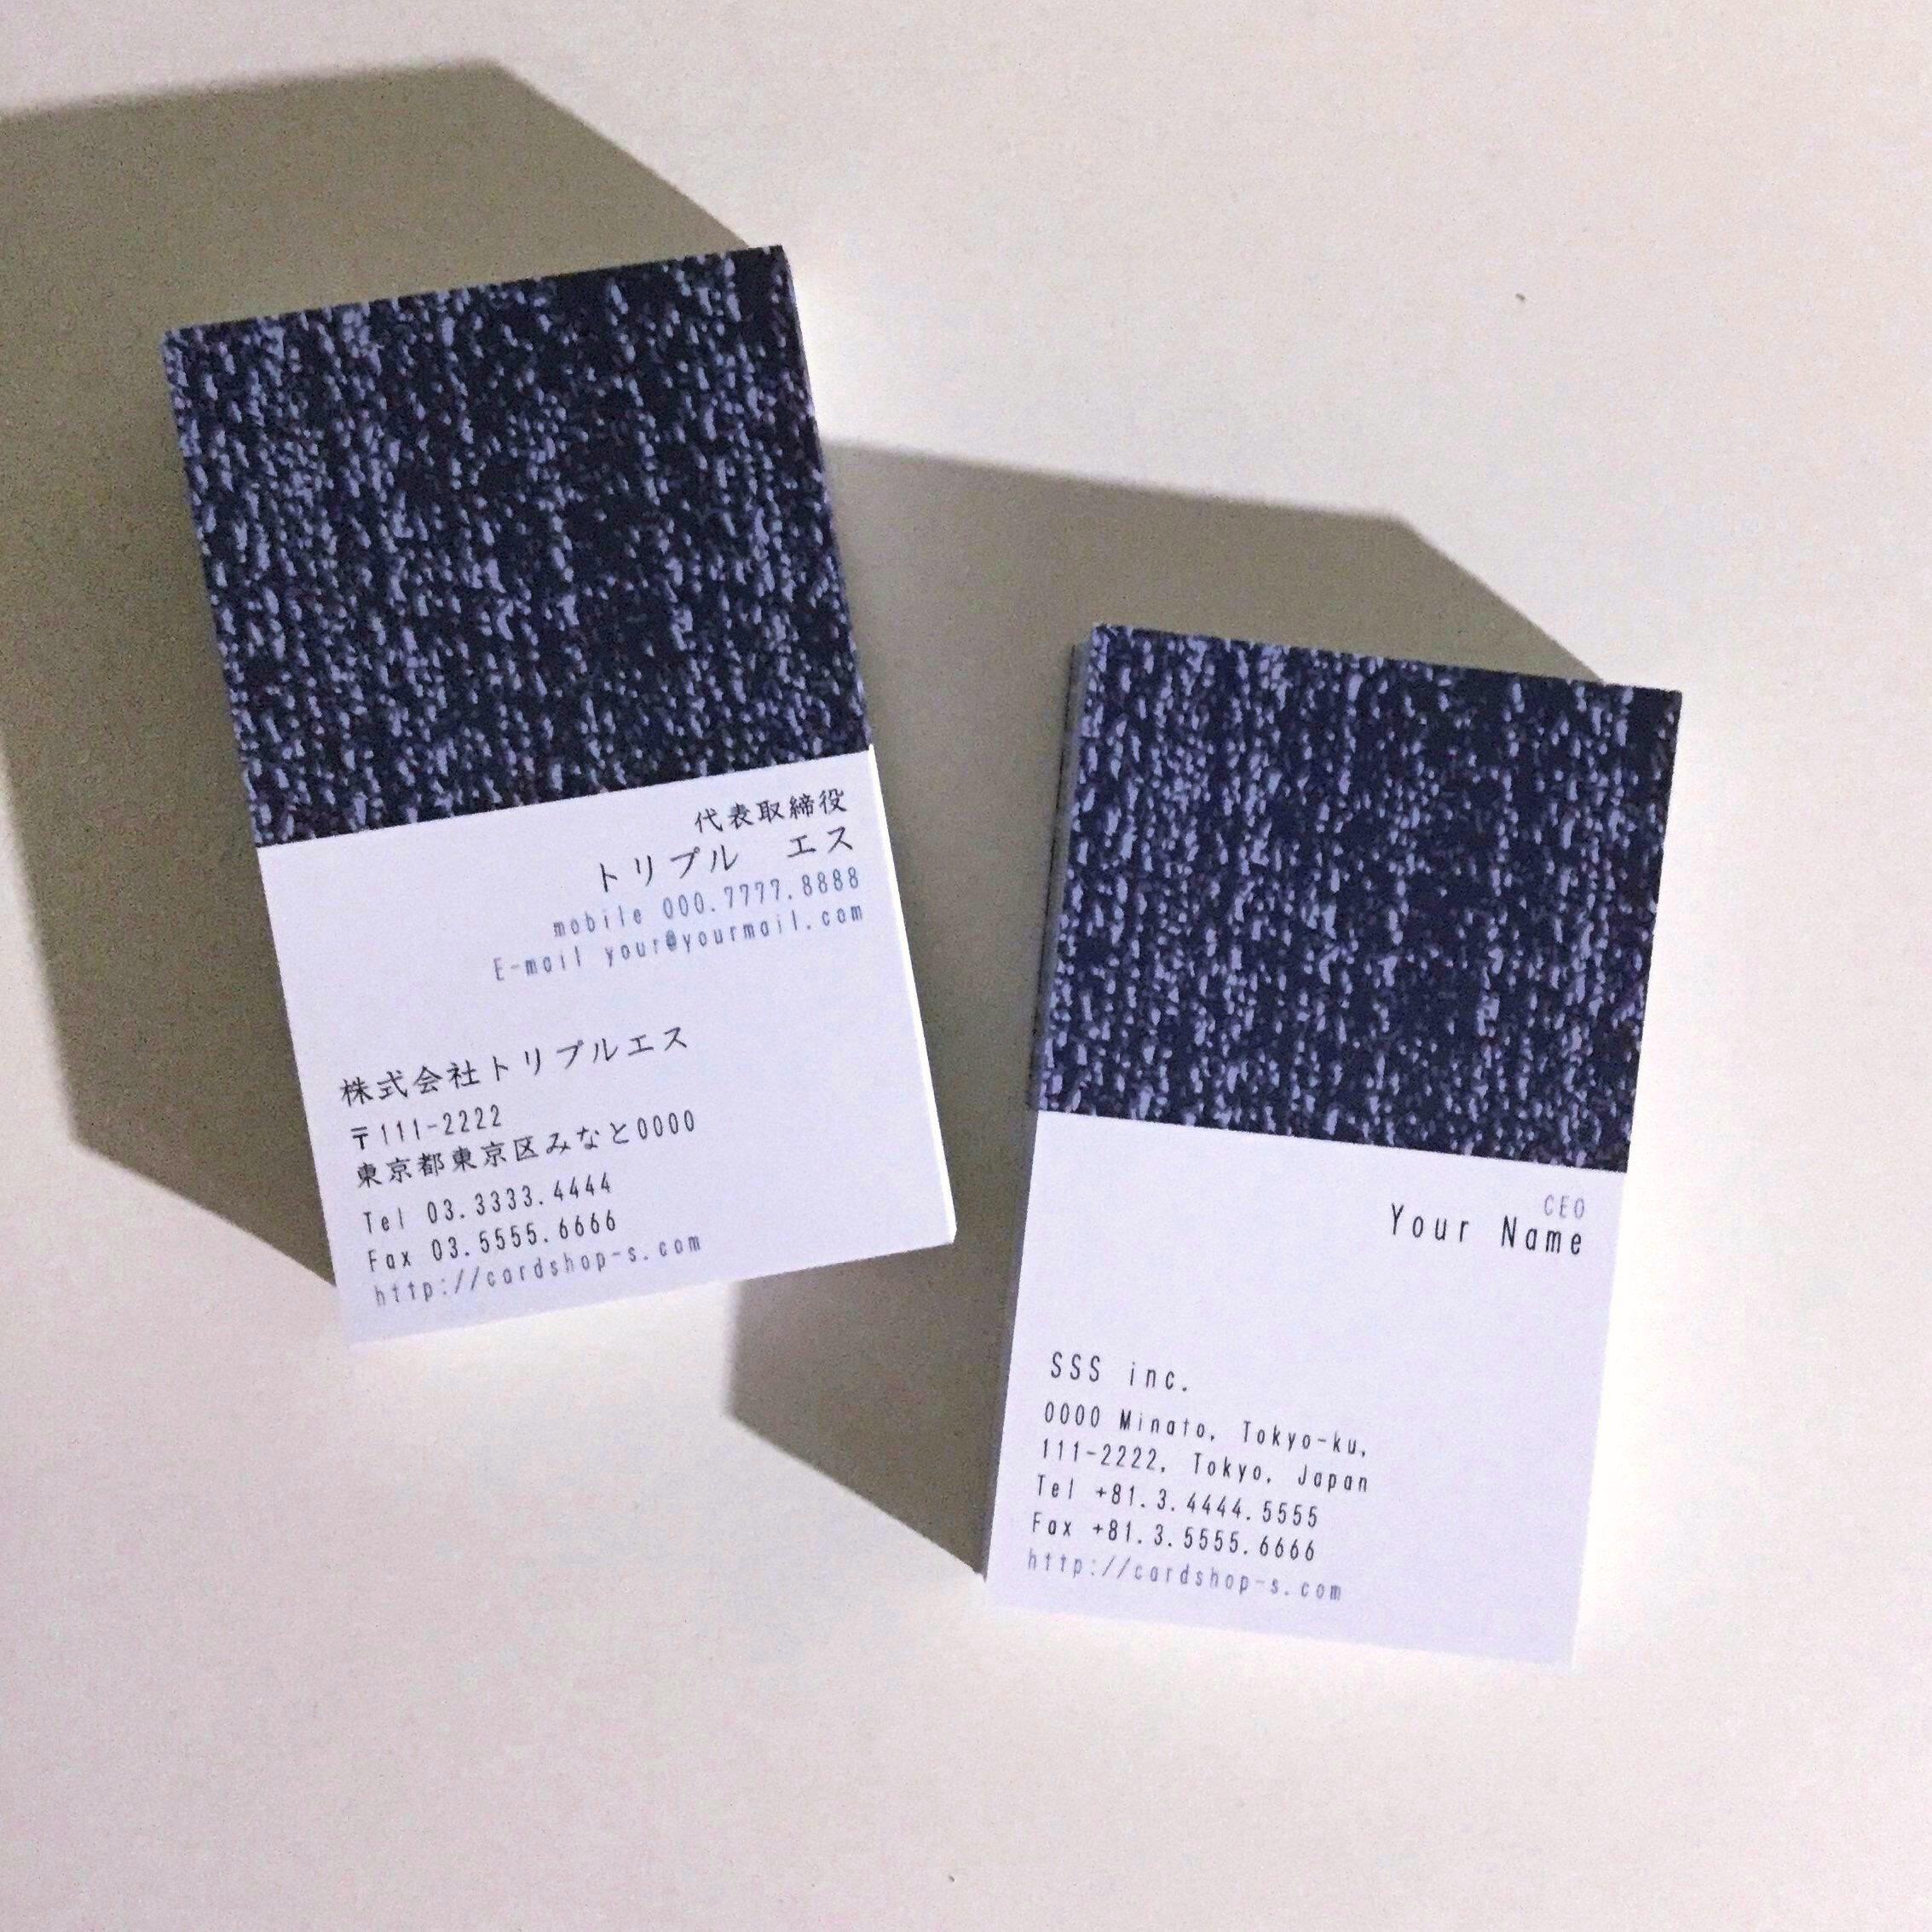 63d1_biz【100枚】ビジネス名刺【英表記】